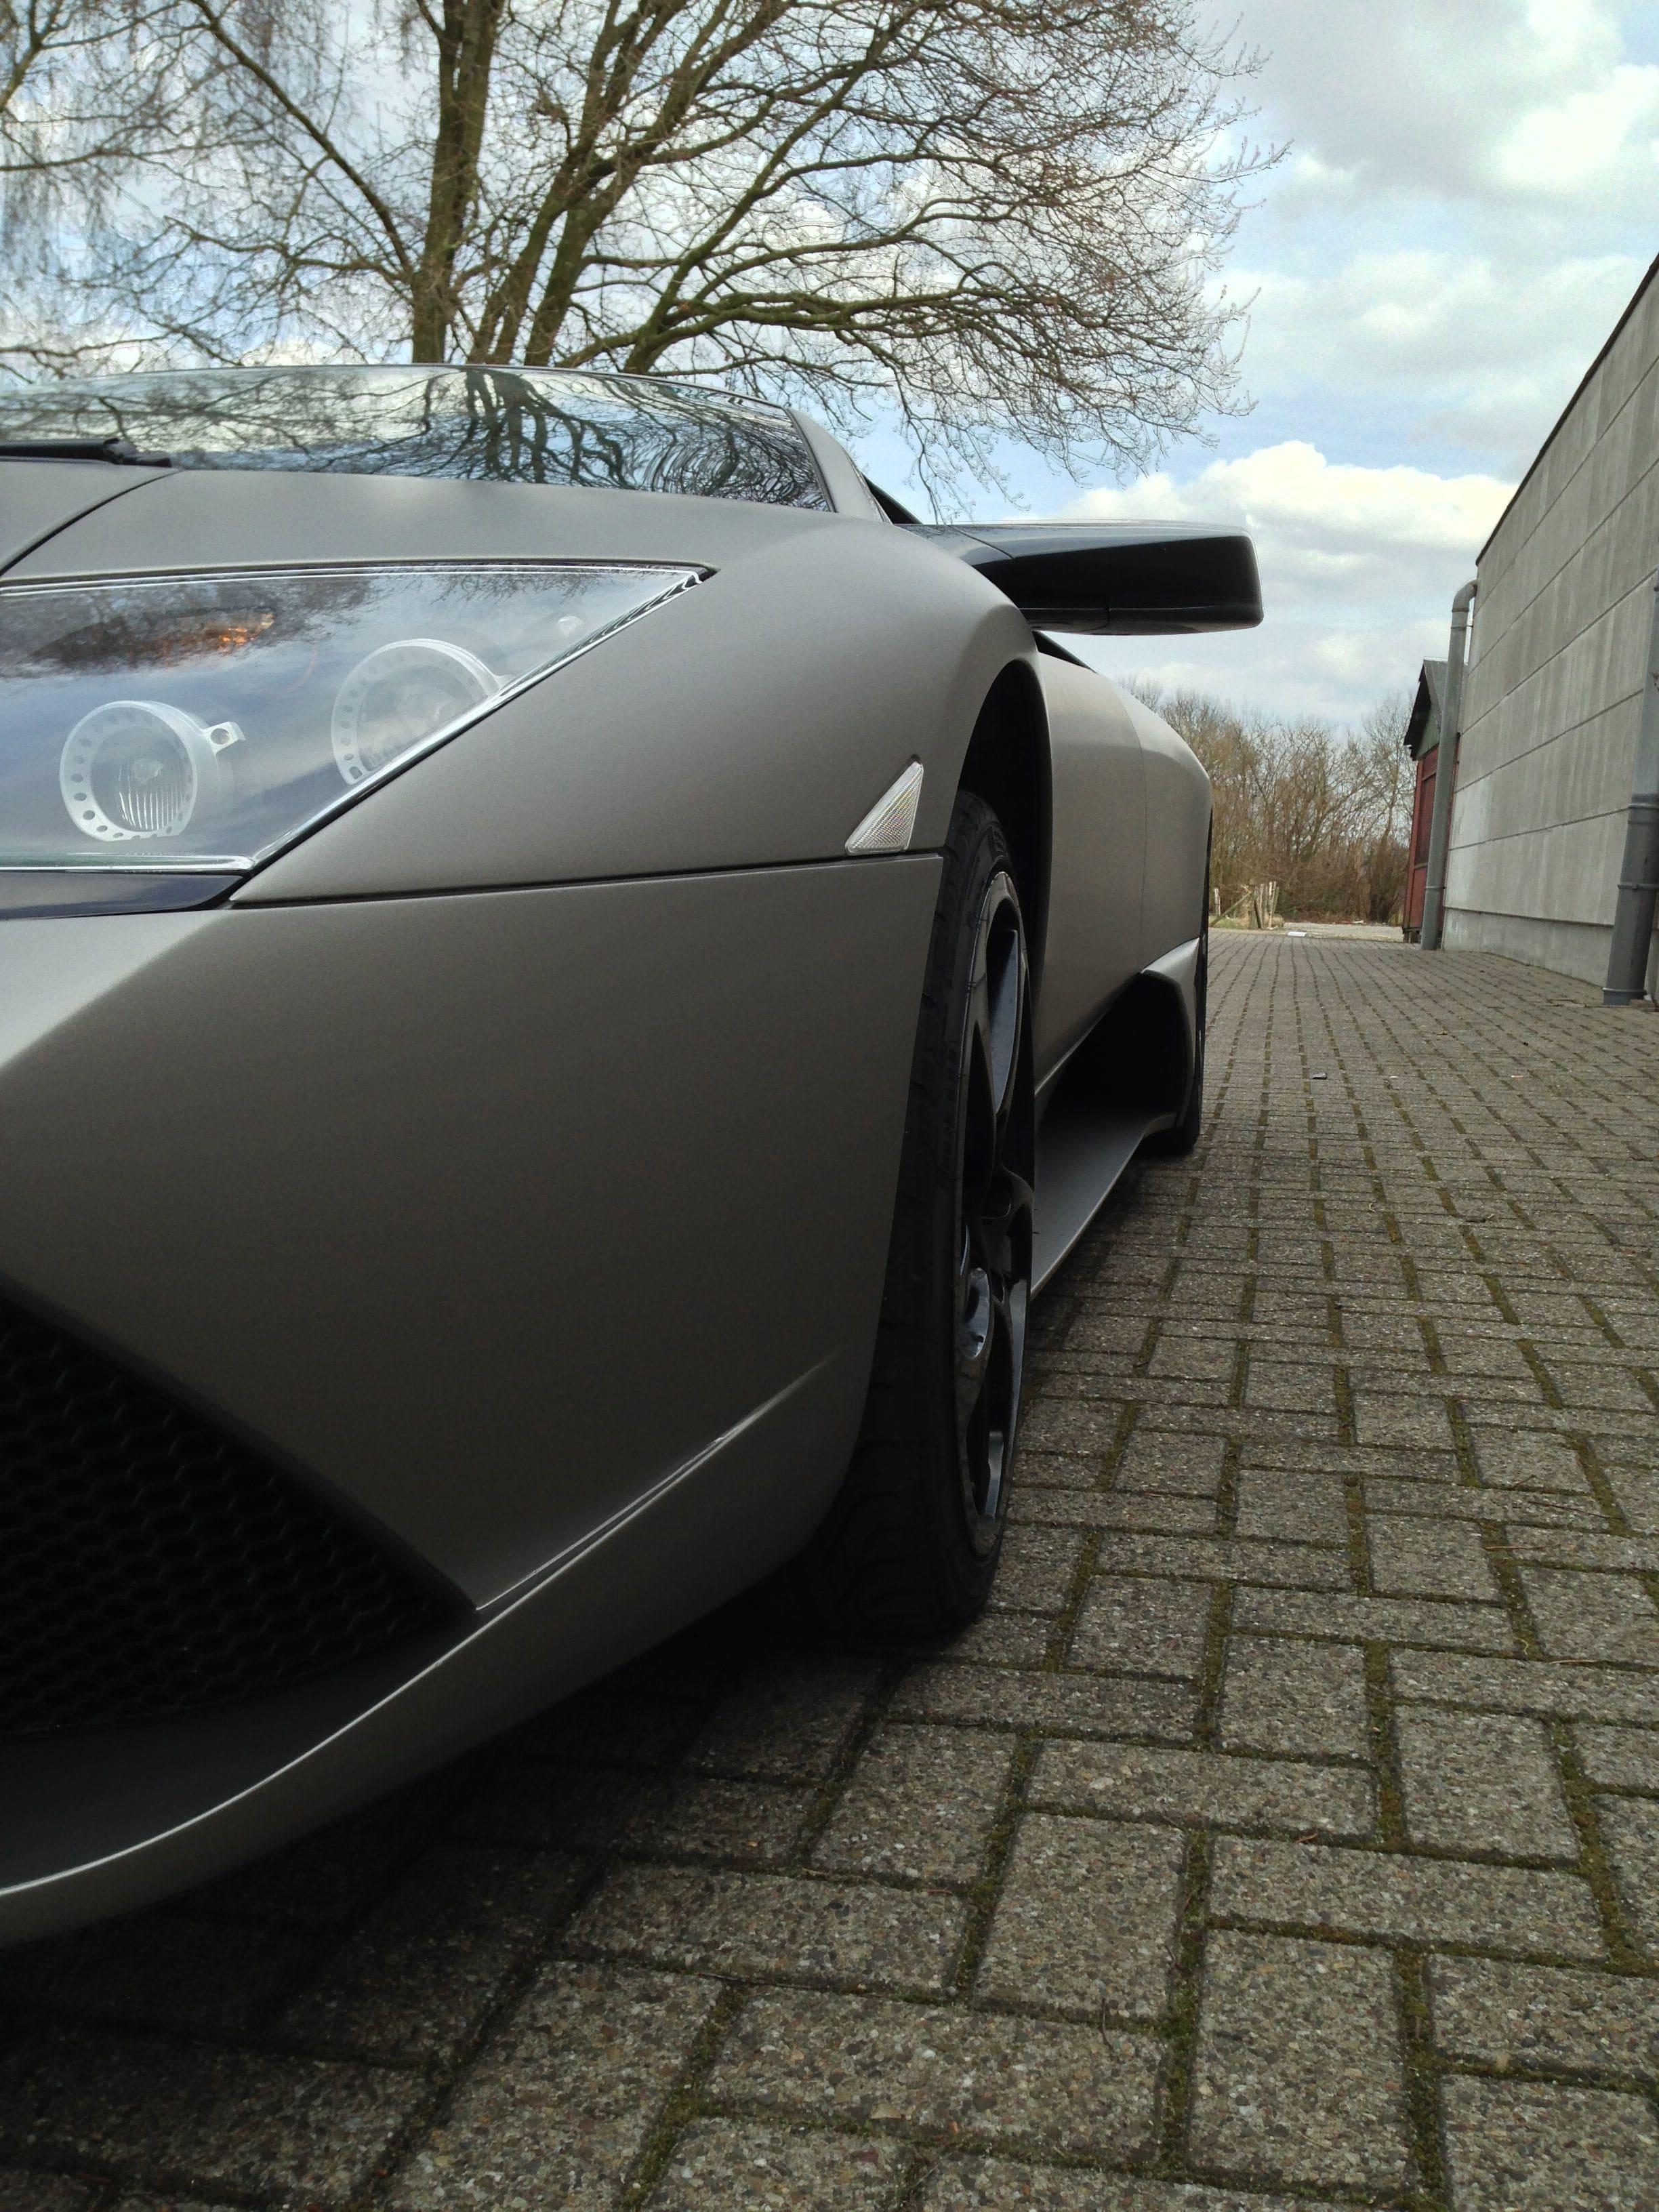 Lamborghini Murcialago LP670 met Gunpowder Wrap, Carwrapping door Wrapmyride.nu Foto-nr:5976, ©2021